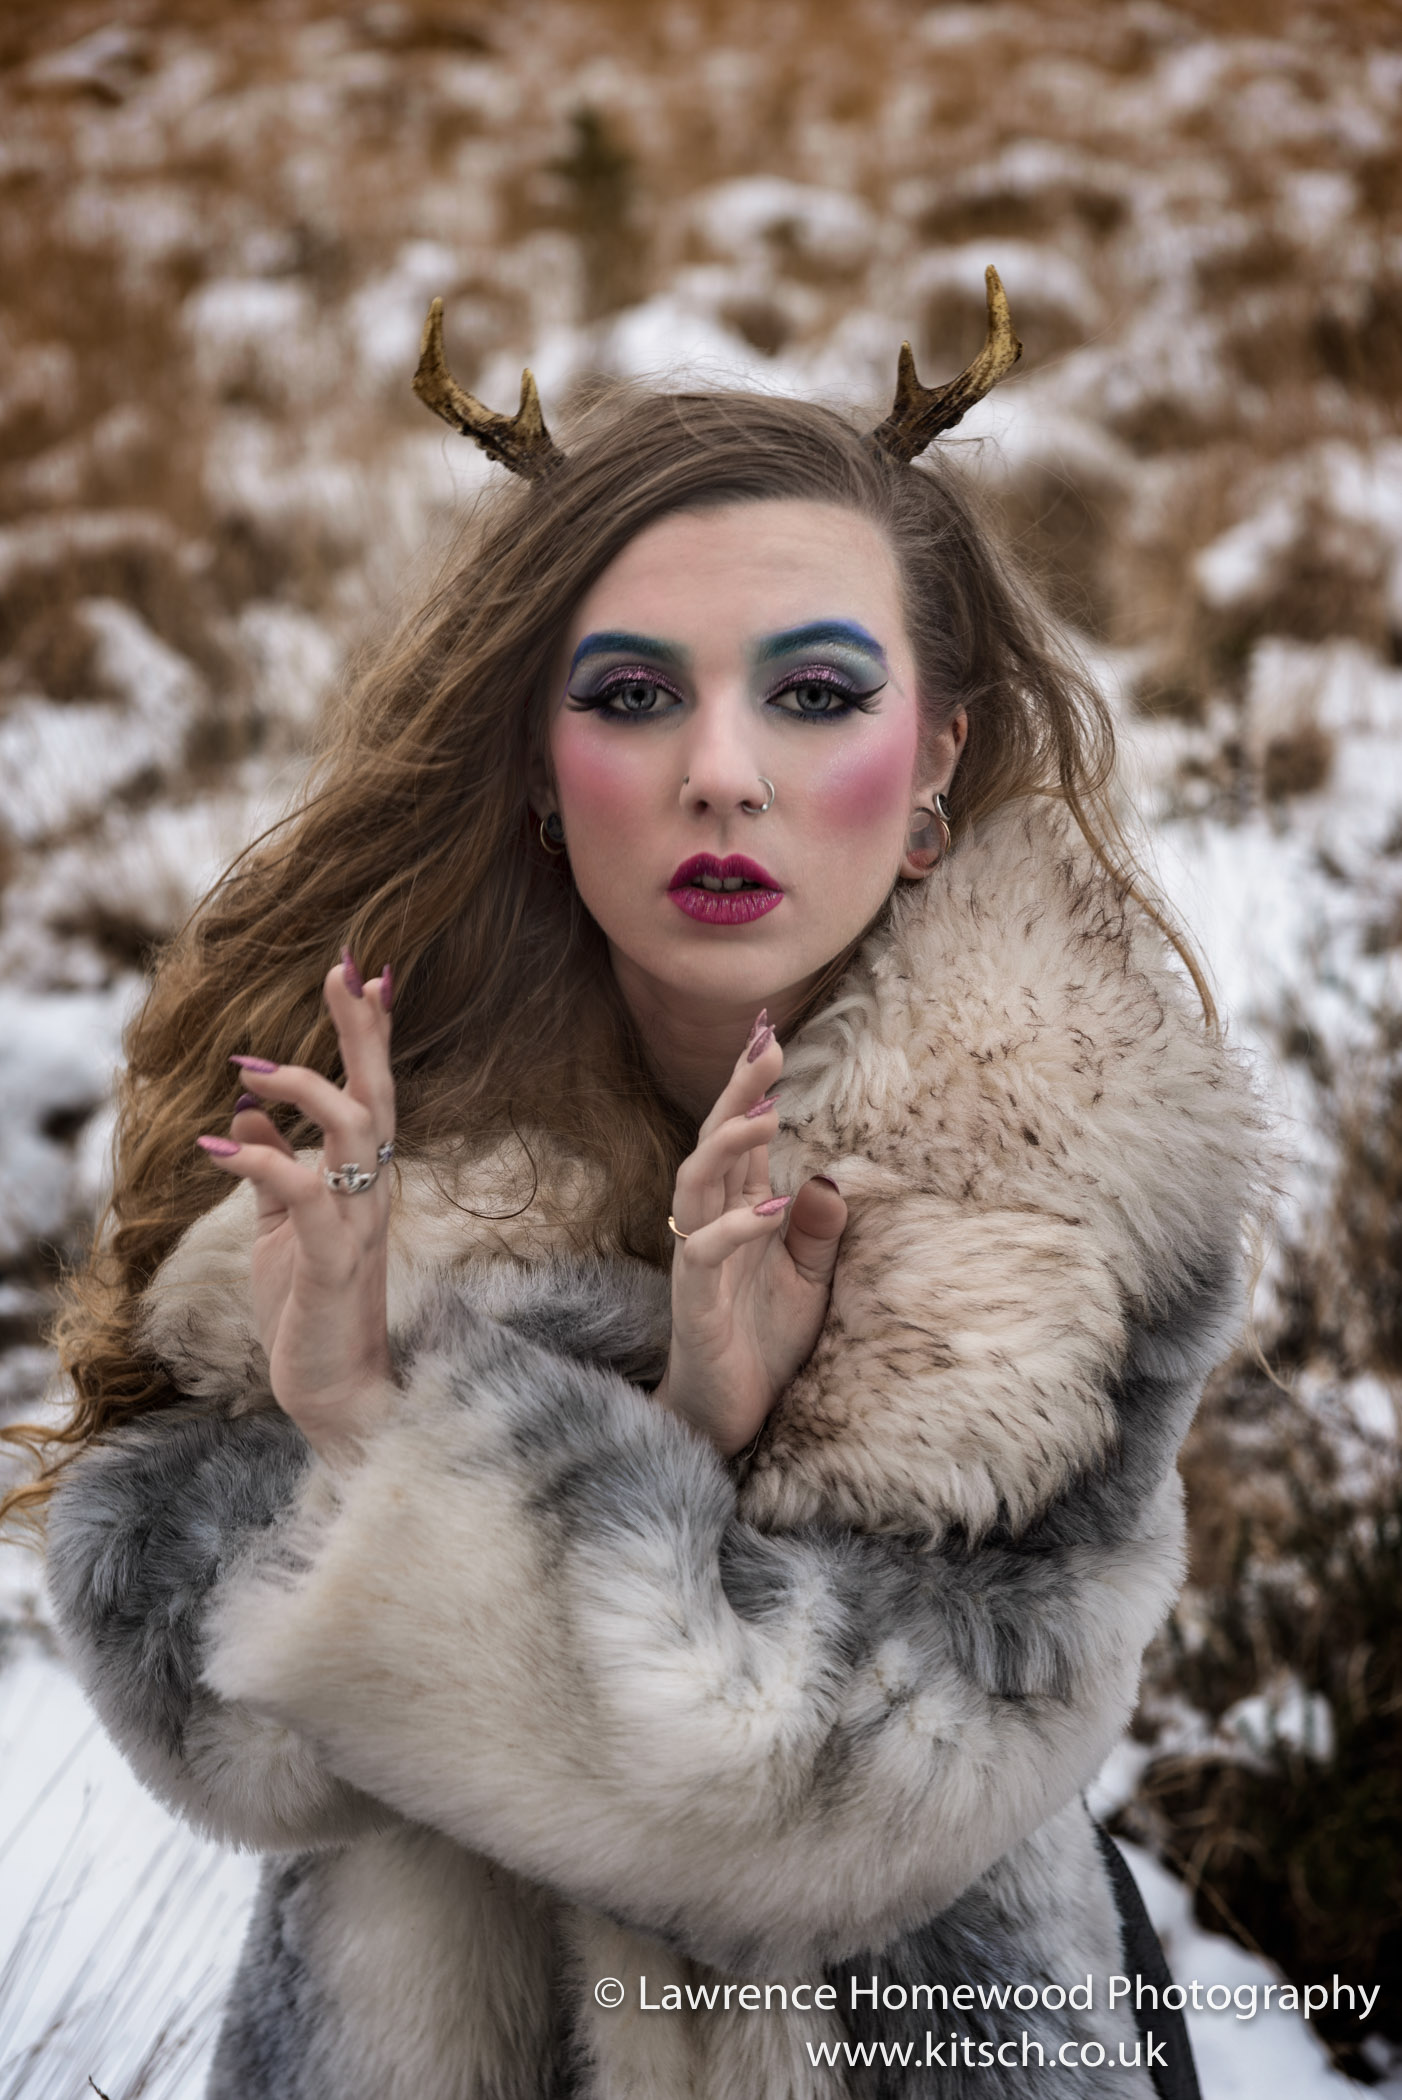 Fawn Princess - A Winters Tale25